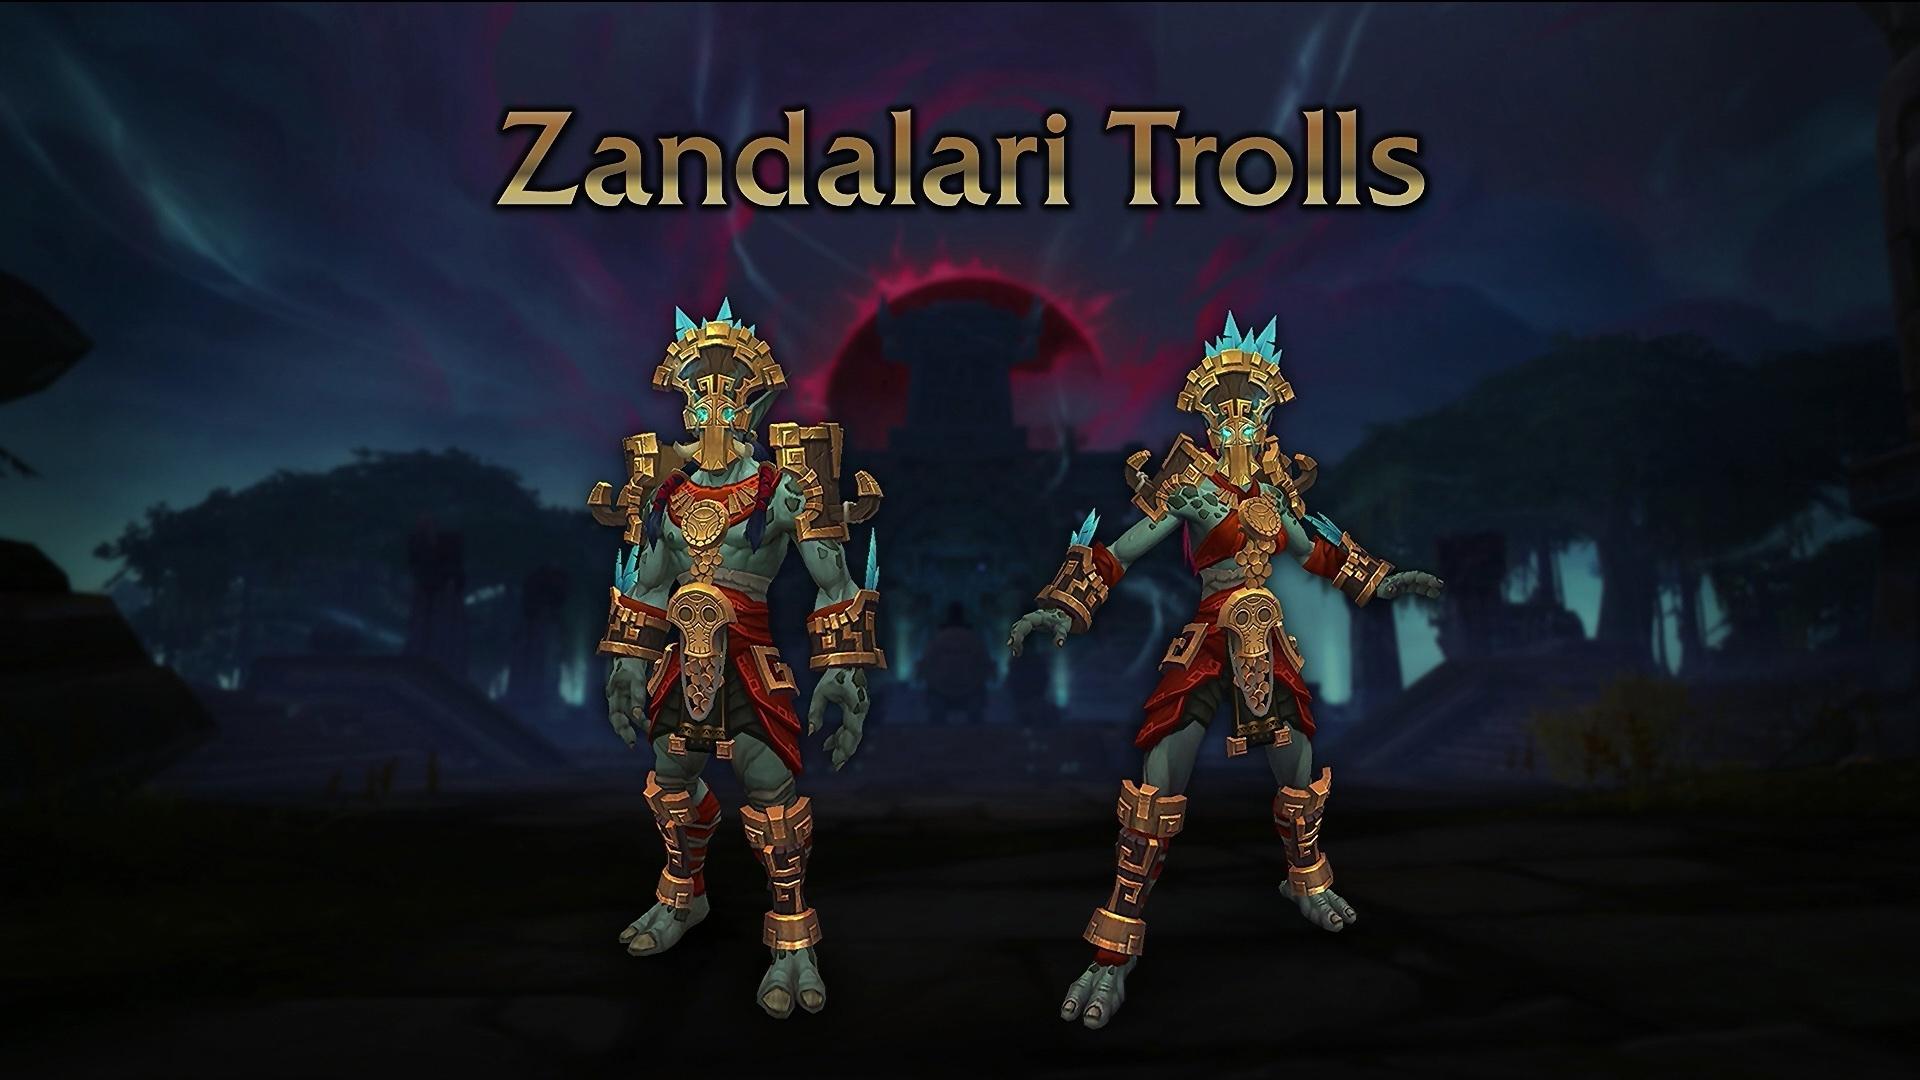 Trolls Zandalari au patch 8.1.5